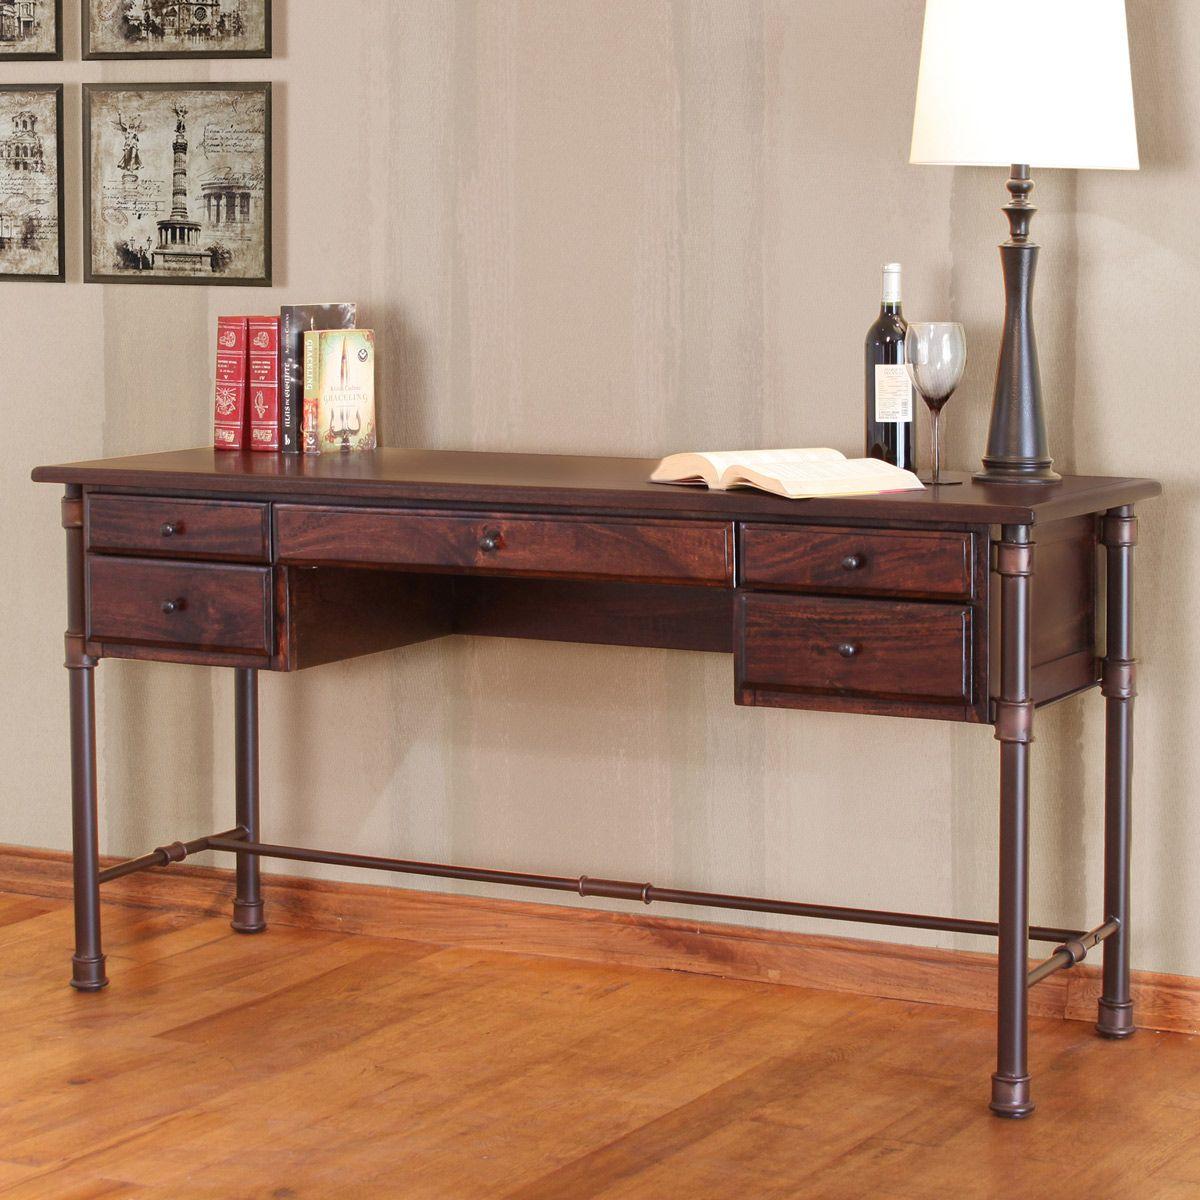 Mango Wood Desk Furniture direct, Mango wood desk